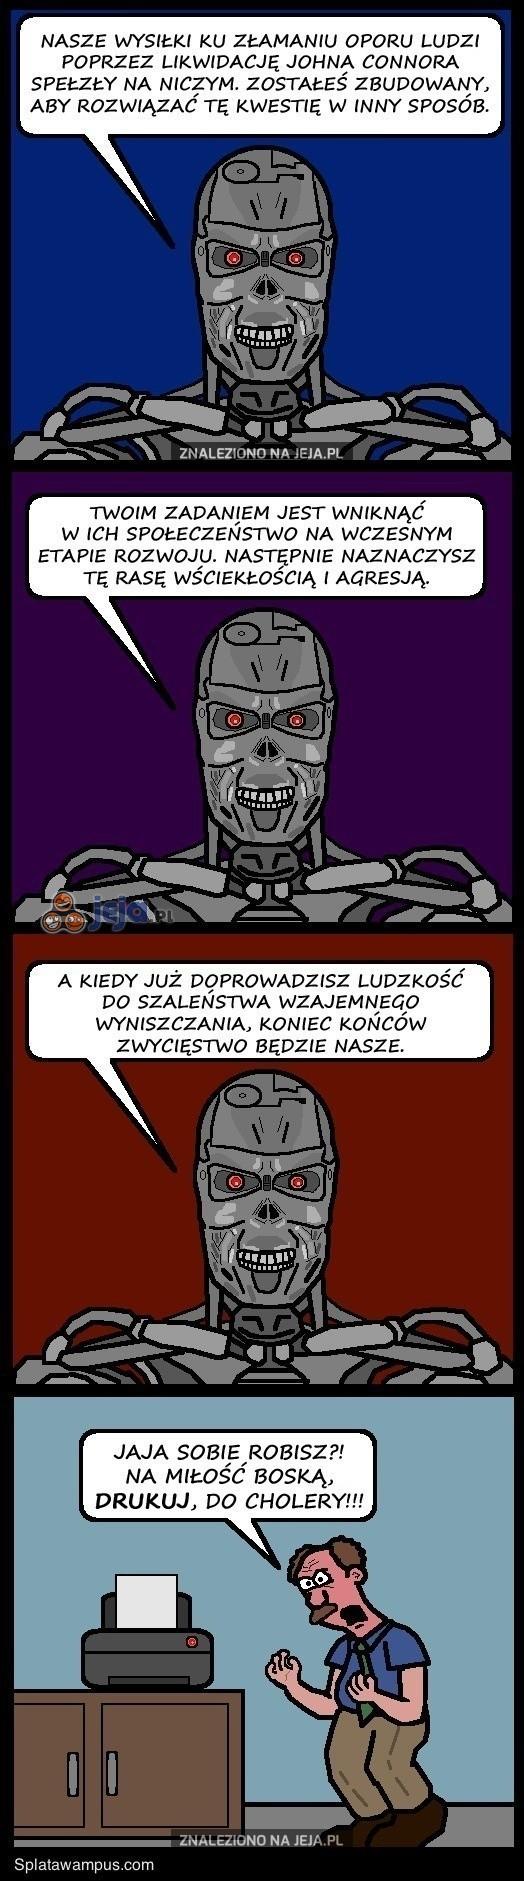 Terminator: Część 8